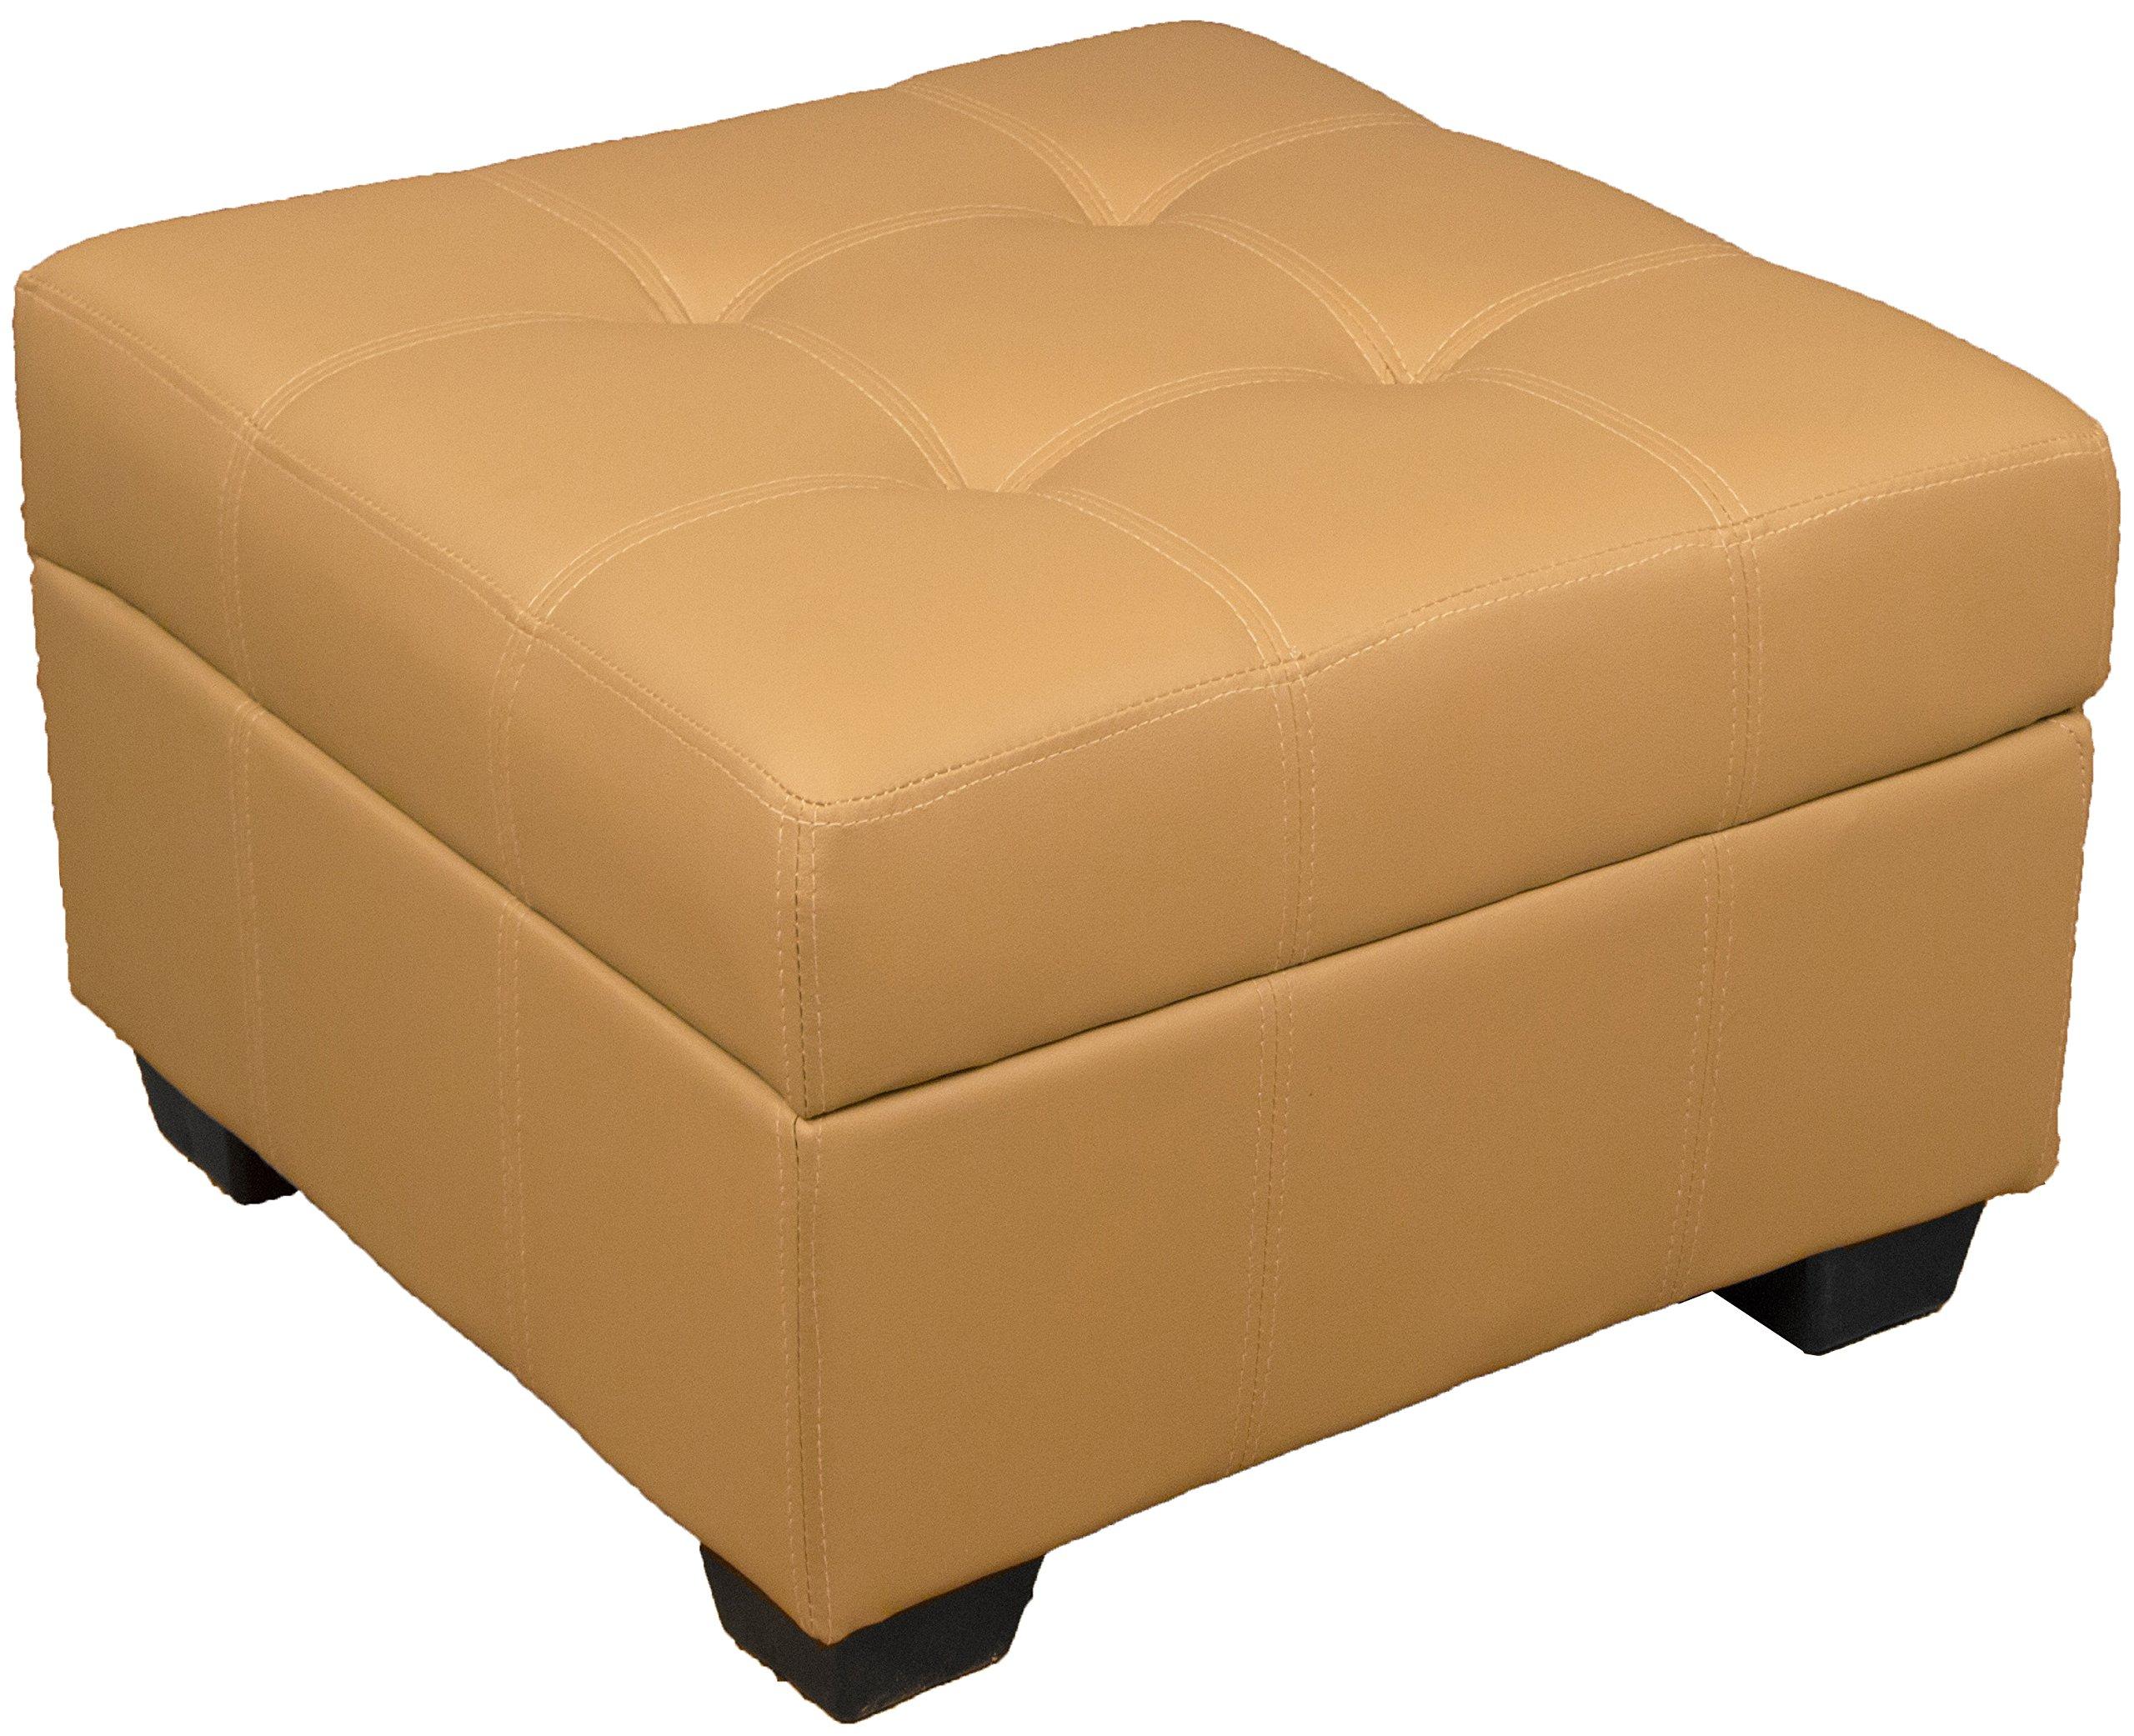 Vanderbilt 24-Inch Square Tufted Padded Hinged Storage Ottoman Bench, Leather Look Buckskin